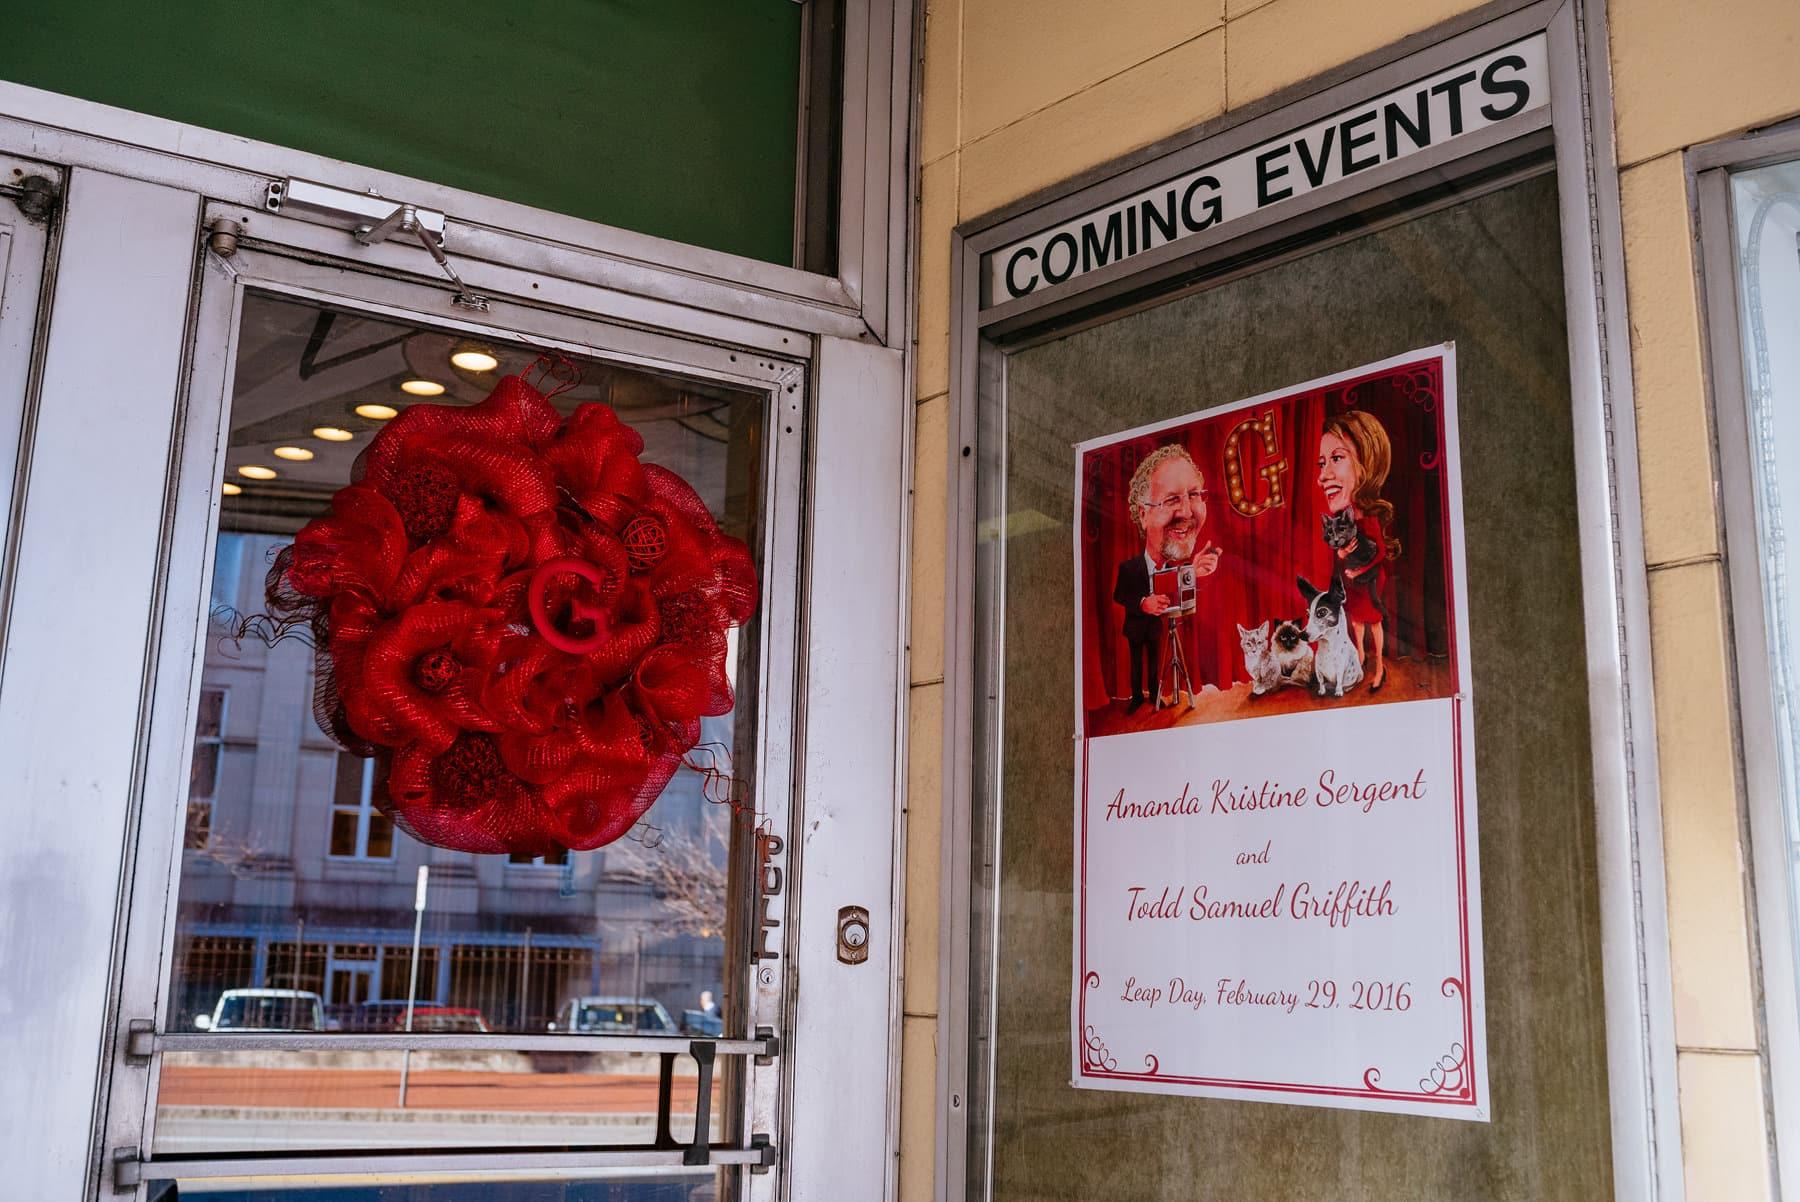 charleston wv wvsu capitol theater wedding